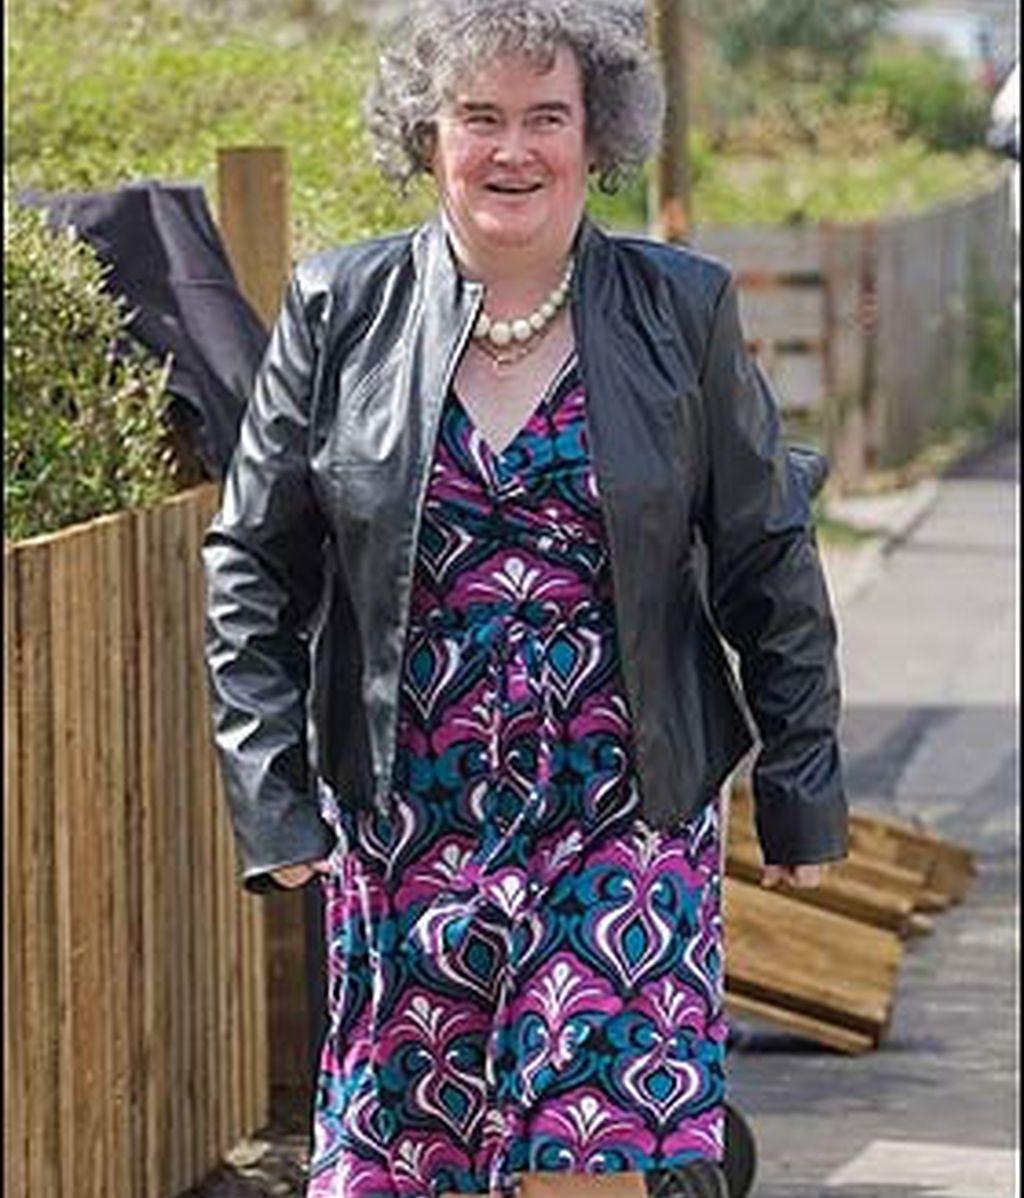 Susan Boyle ha modernizado su vestimenta. Foto: The Sun